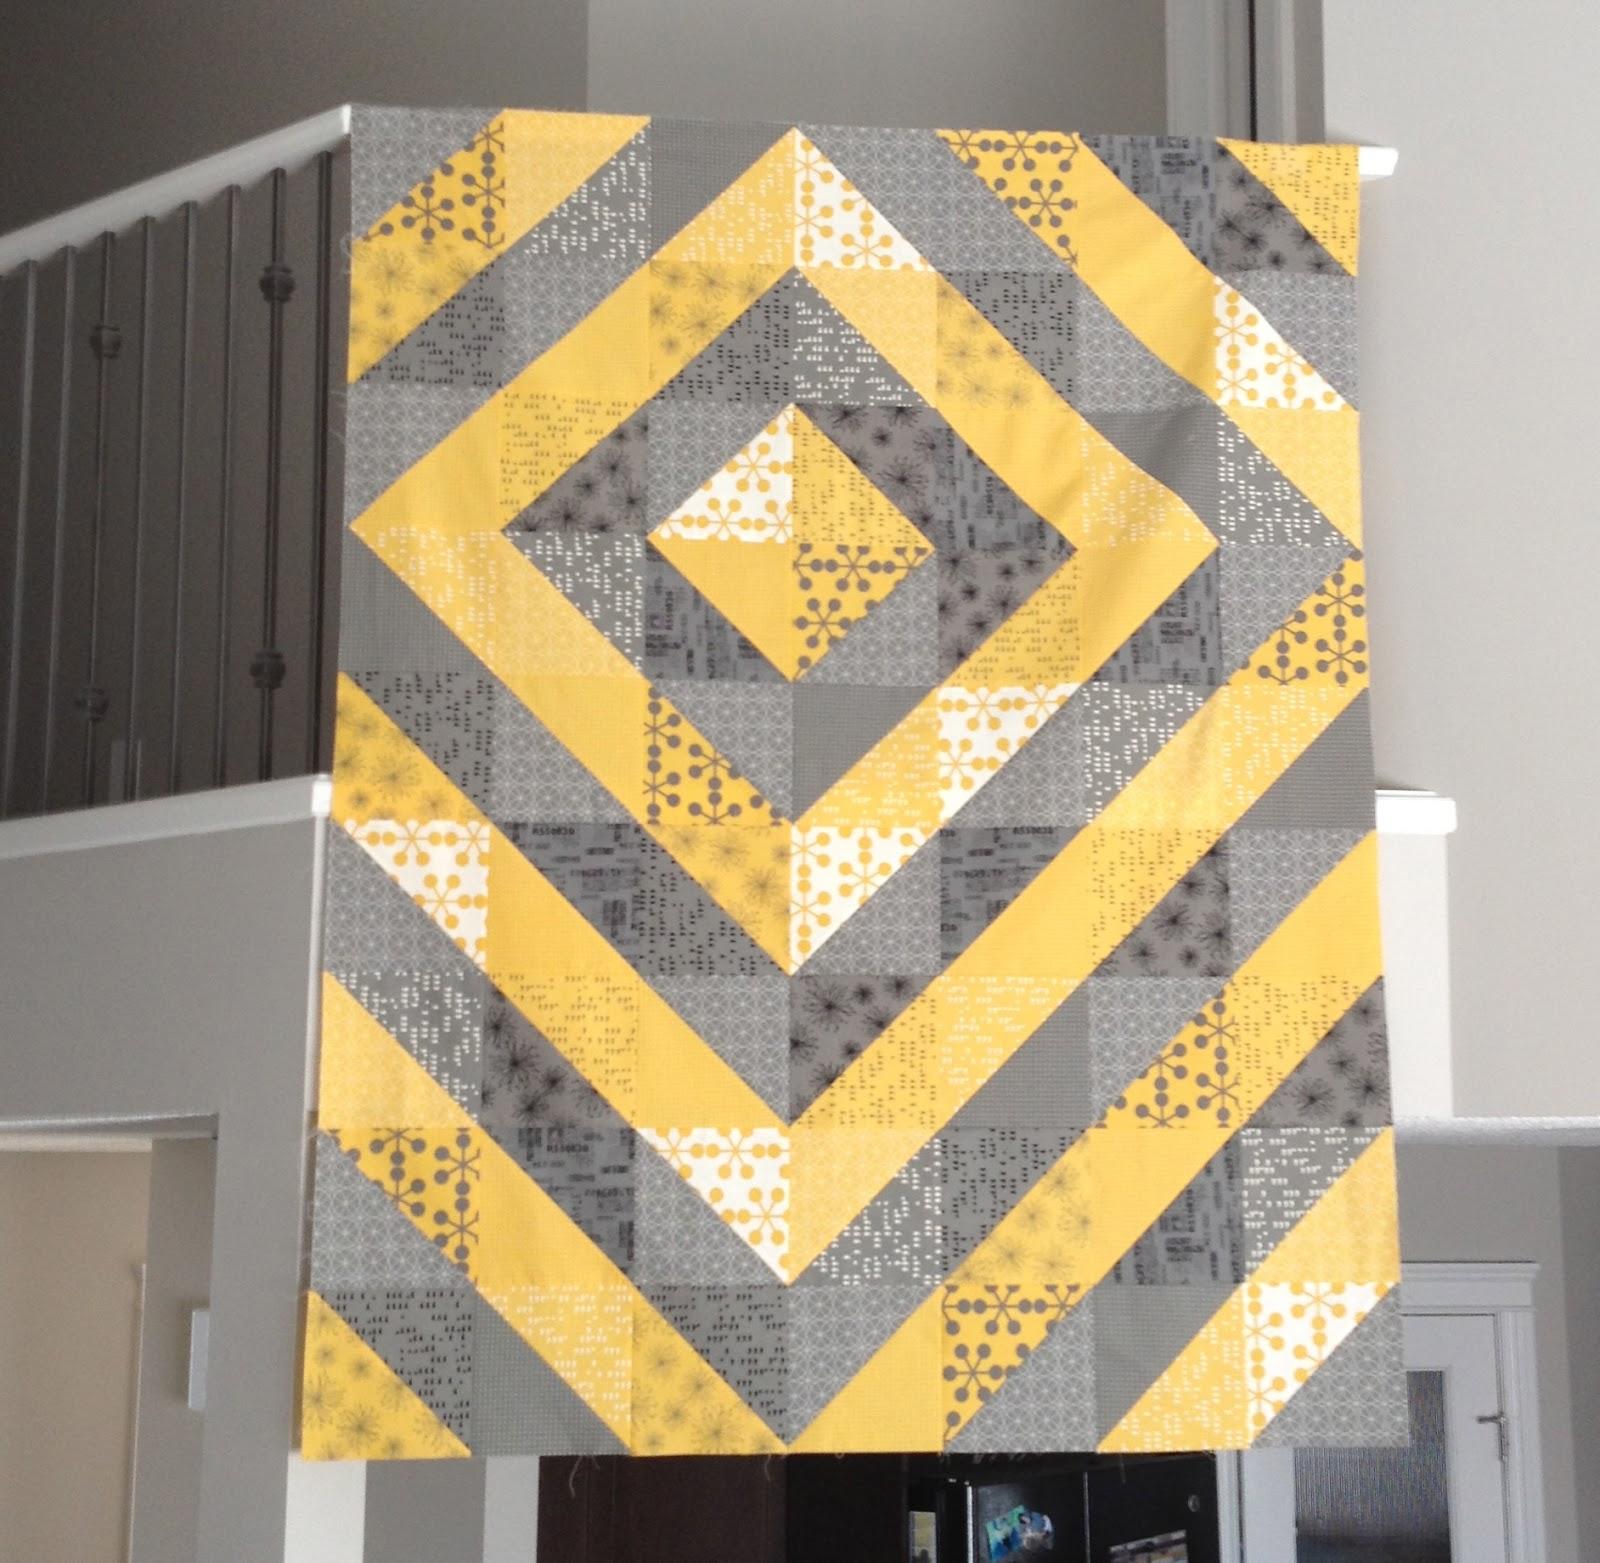 wedding quilt ideas - Wedding Decor Ideas